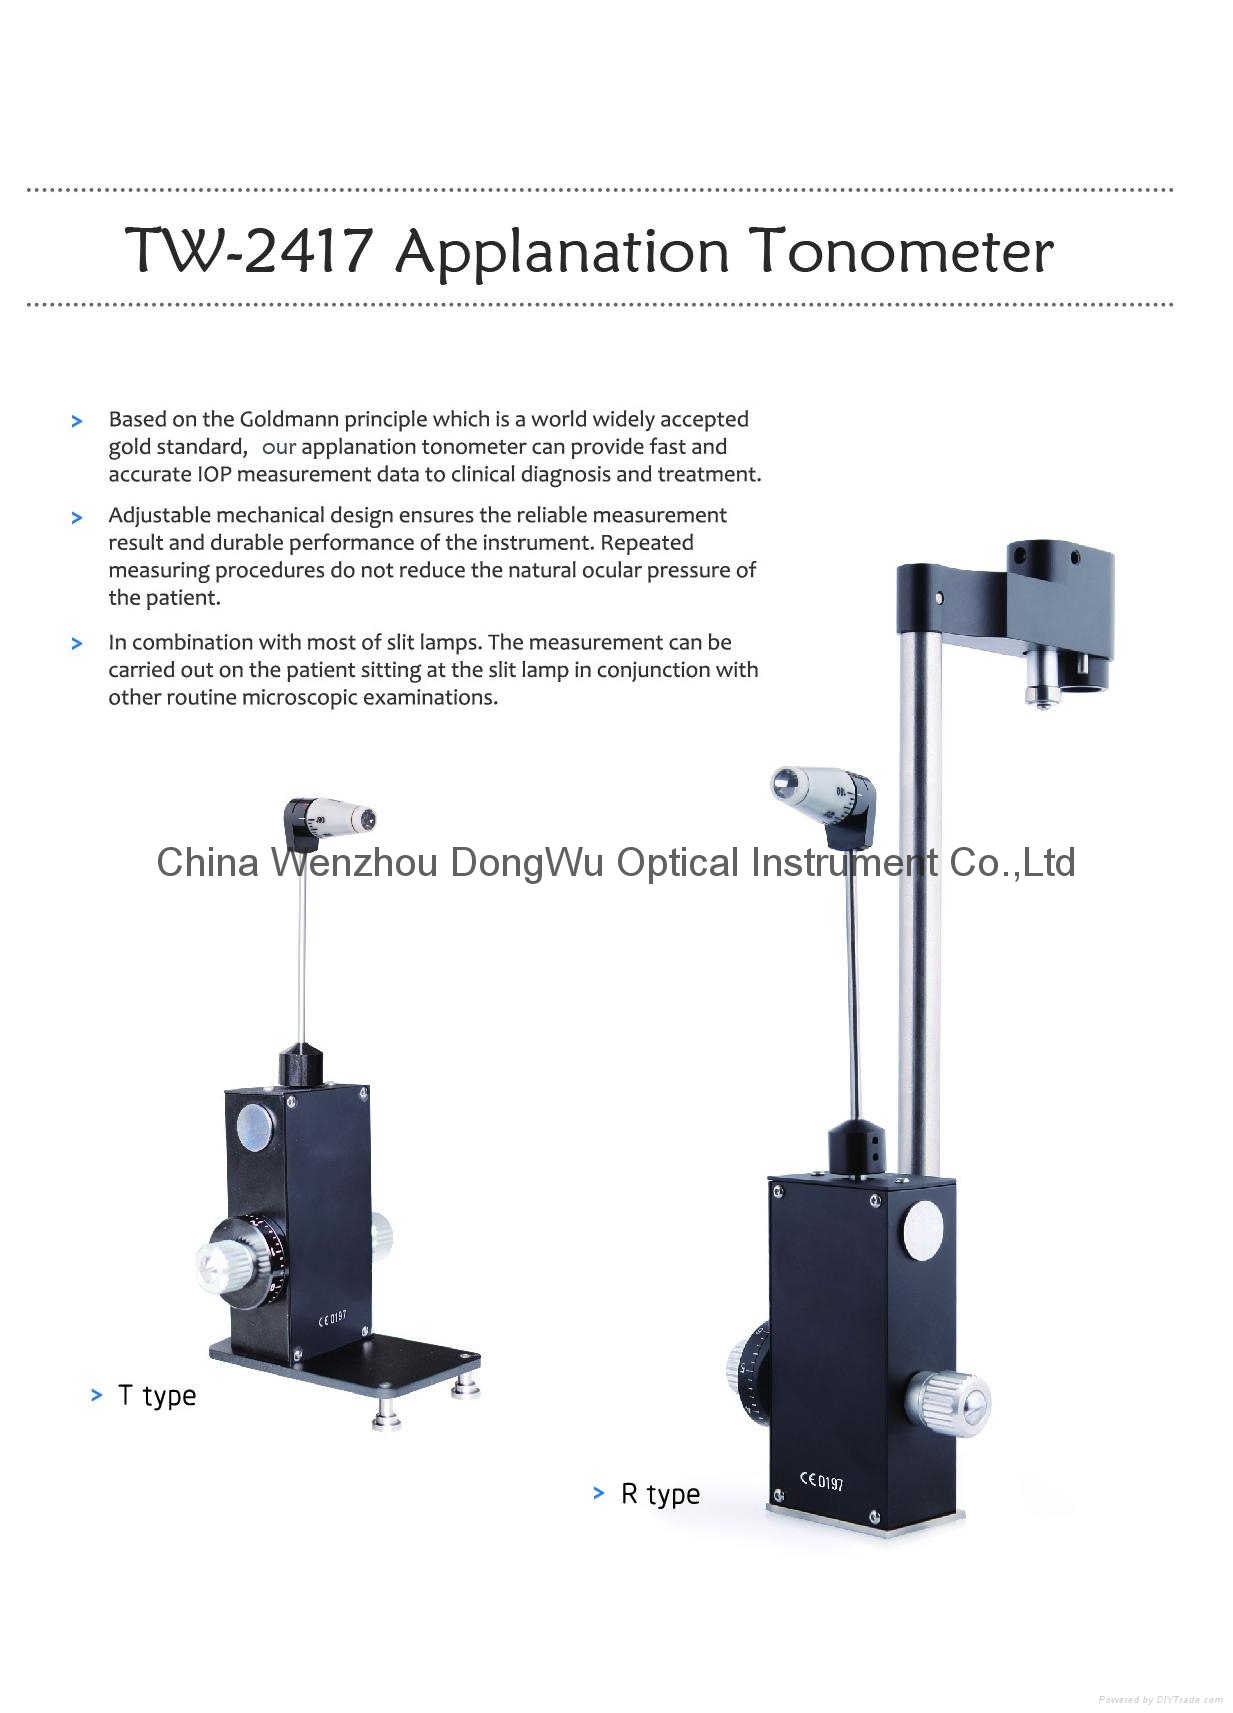 TW-2417 R /T type GOLDMANN Type Applanation Tonometer 1